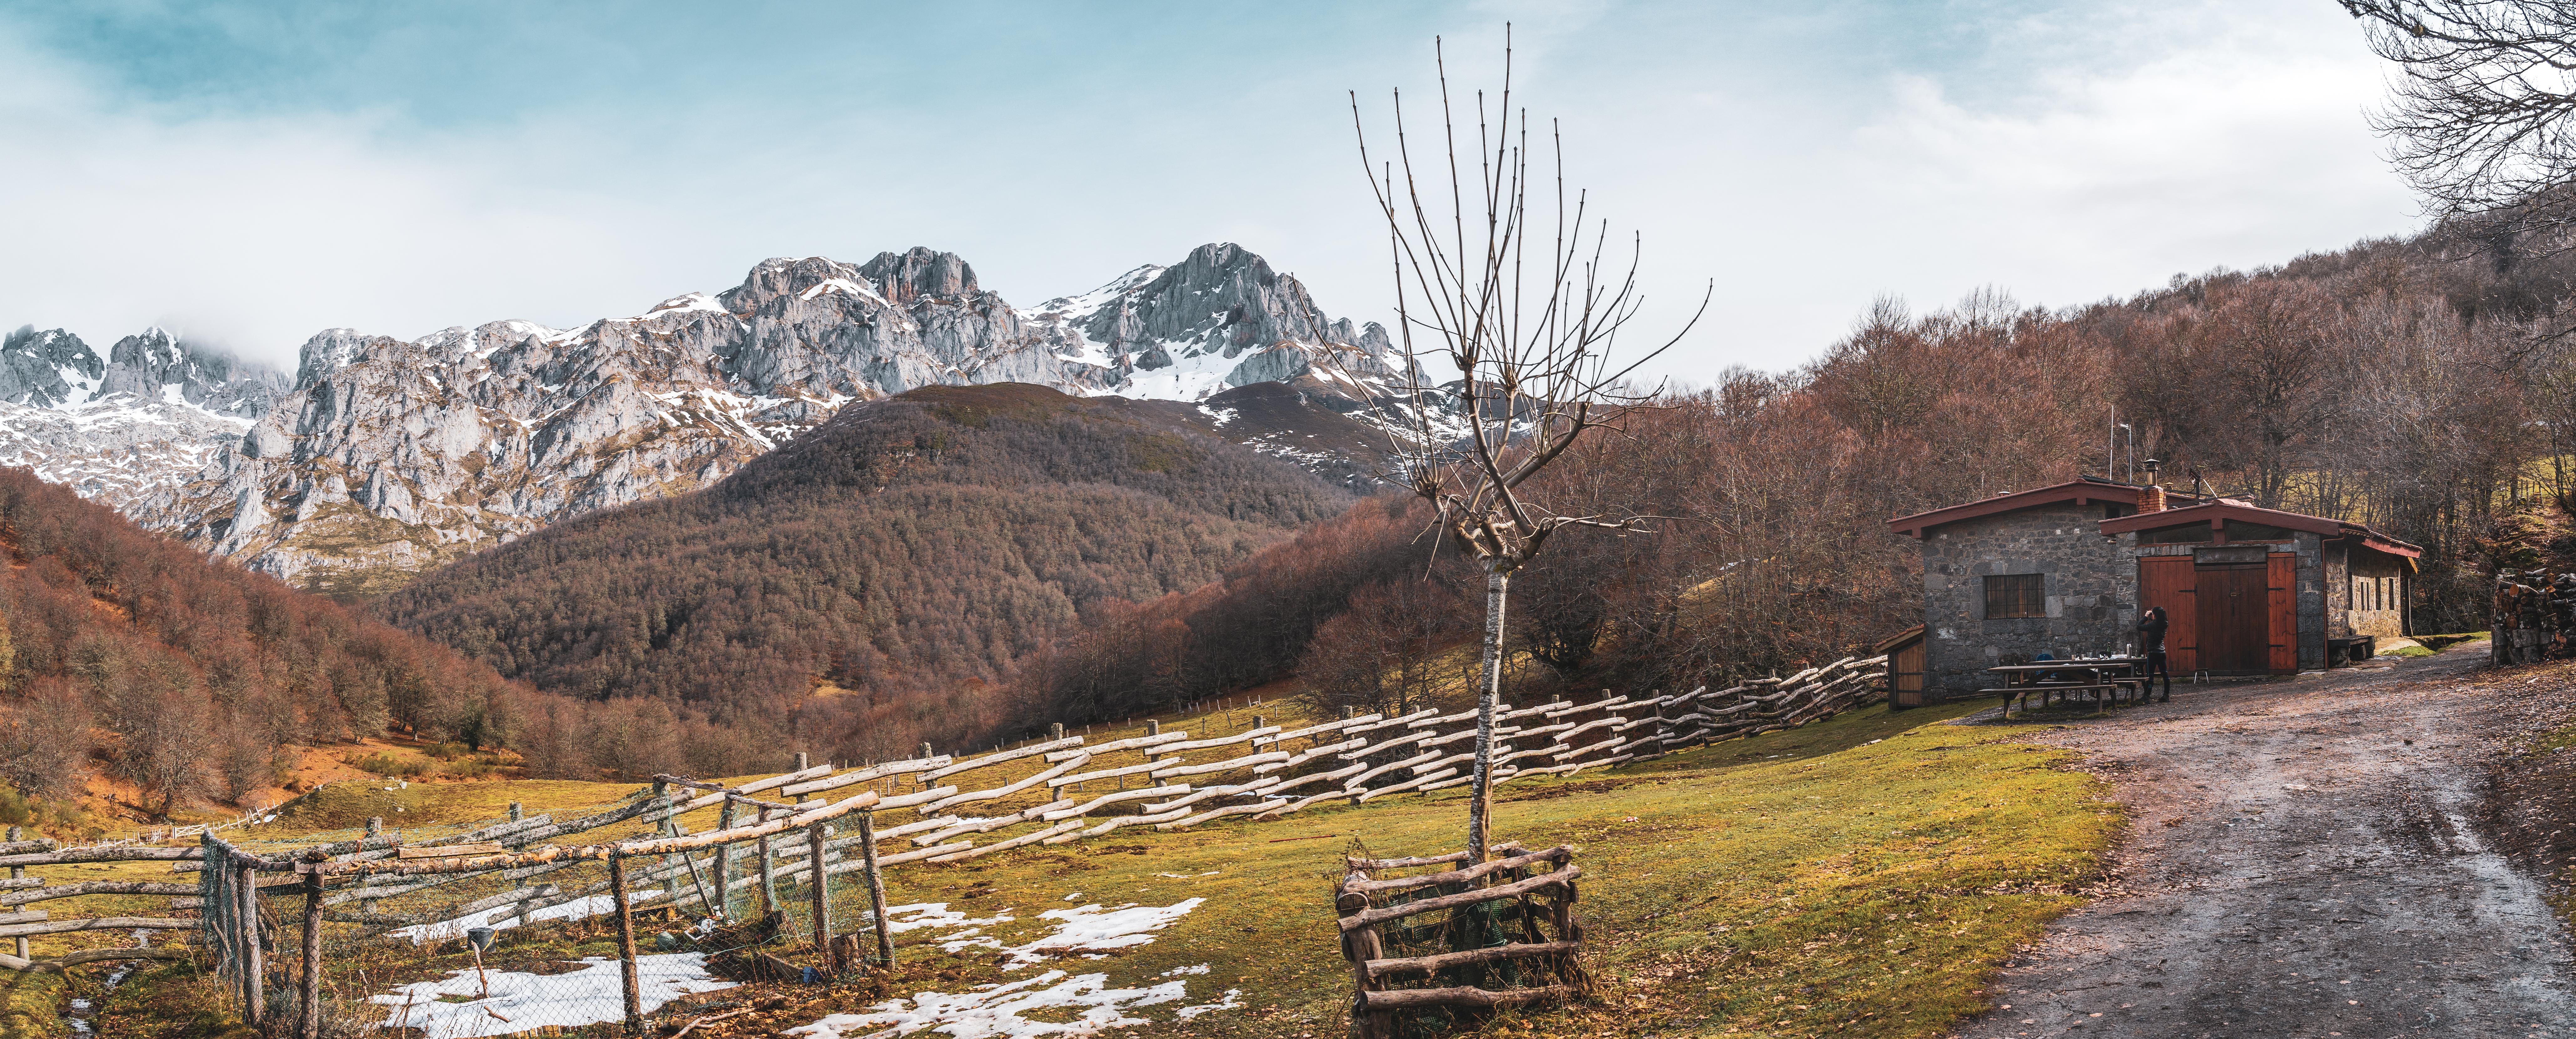 Refugio de Montaña de Vegabaño1